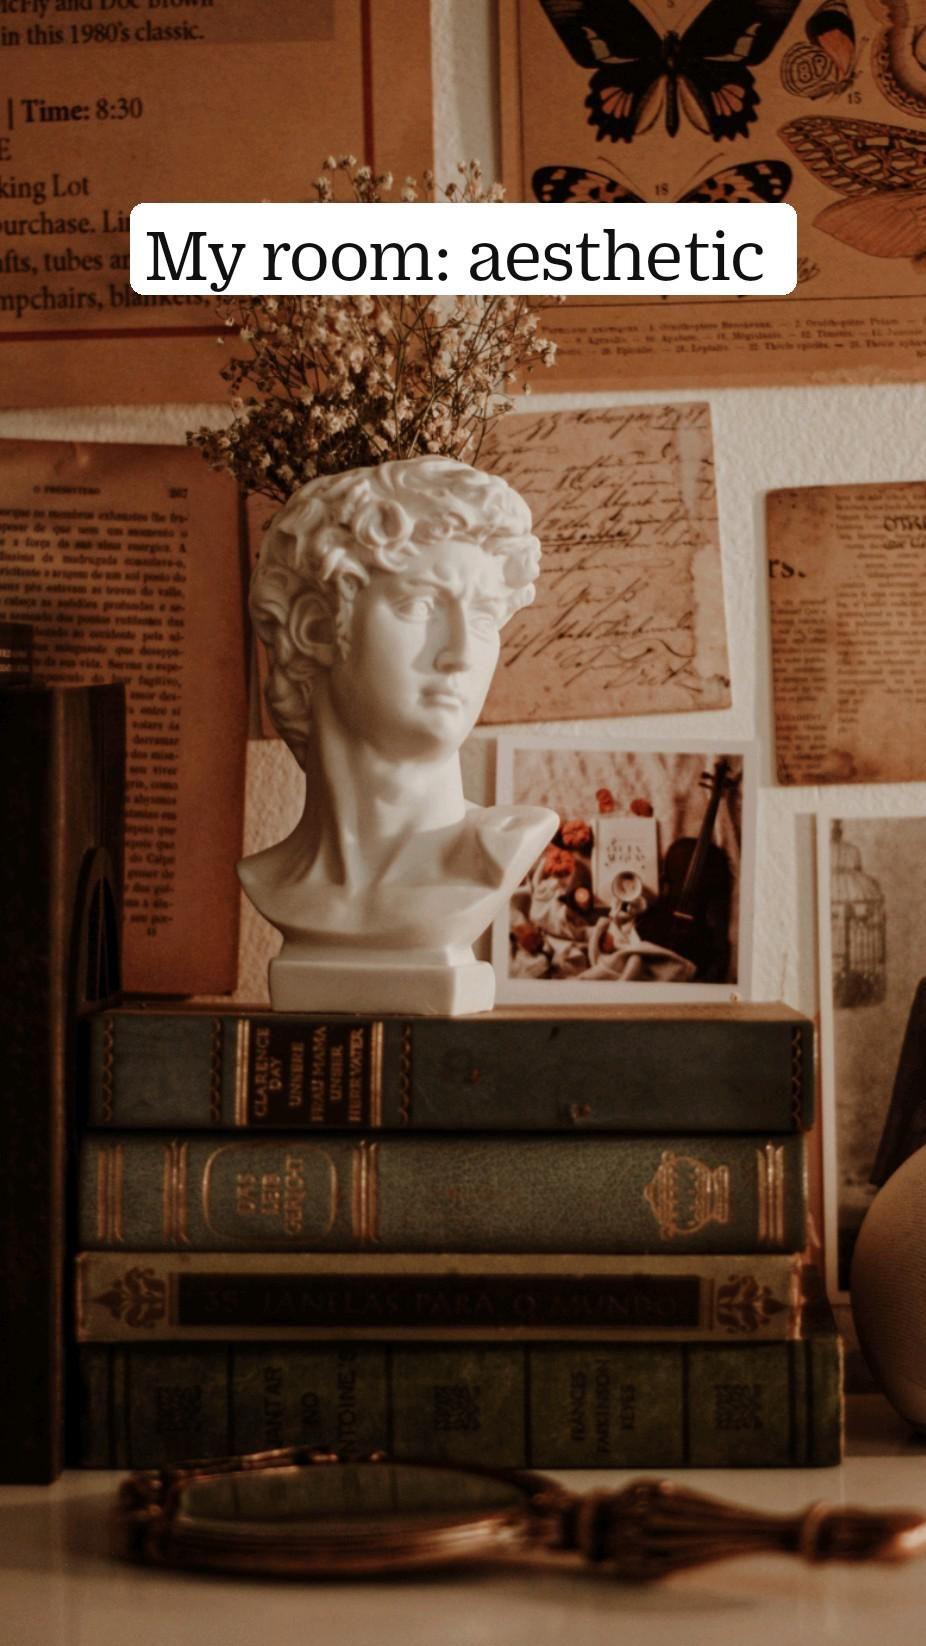 My room: aesthetic